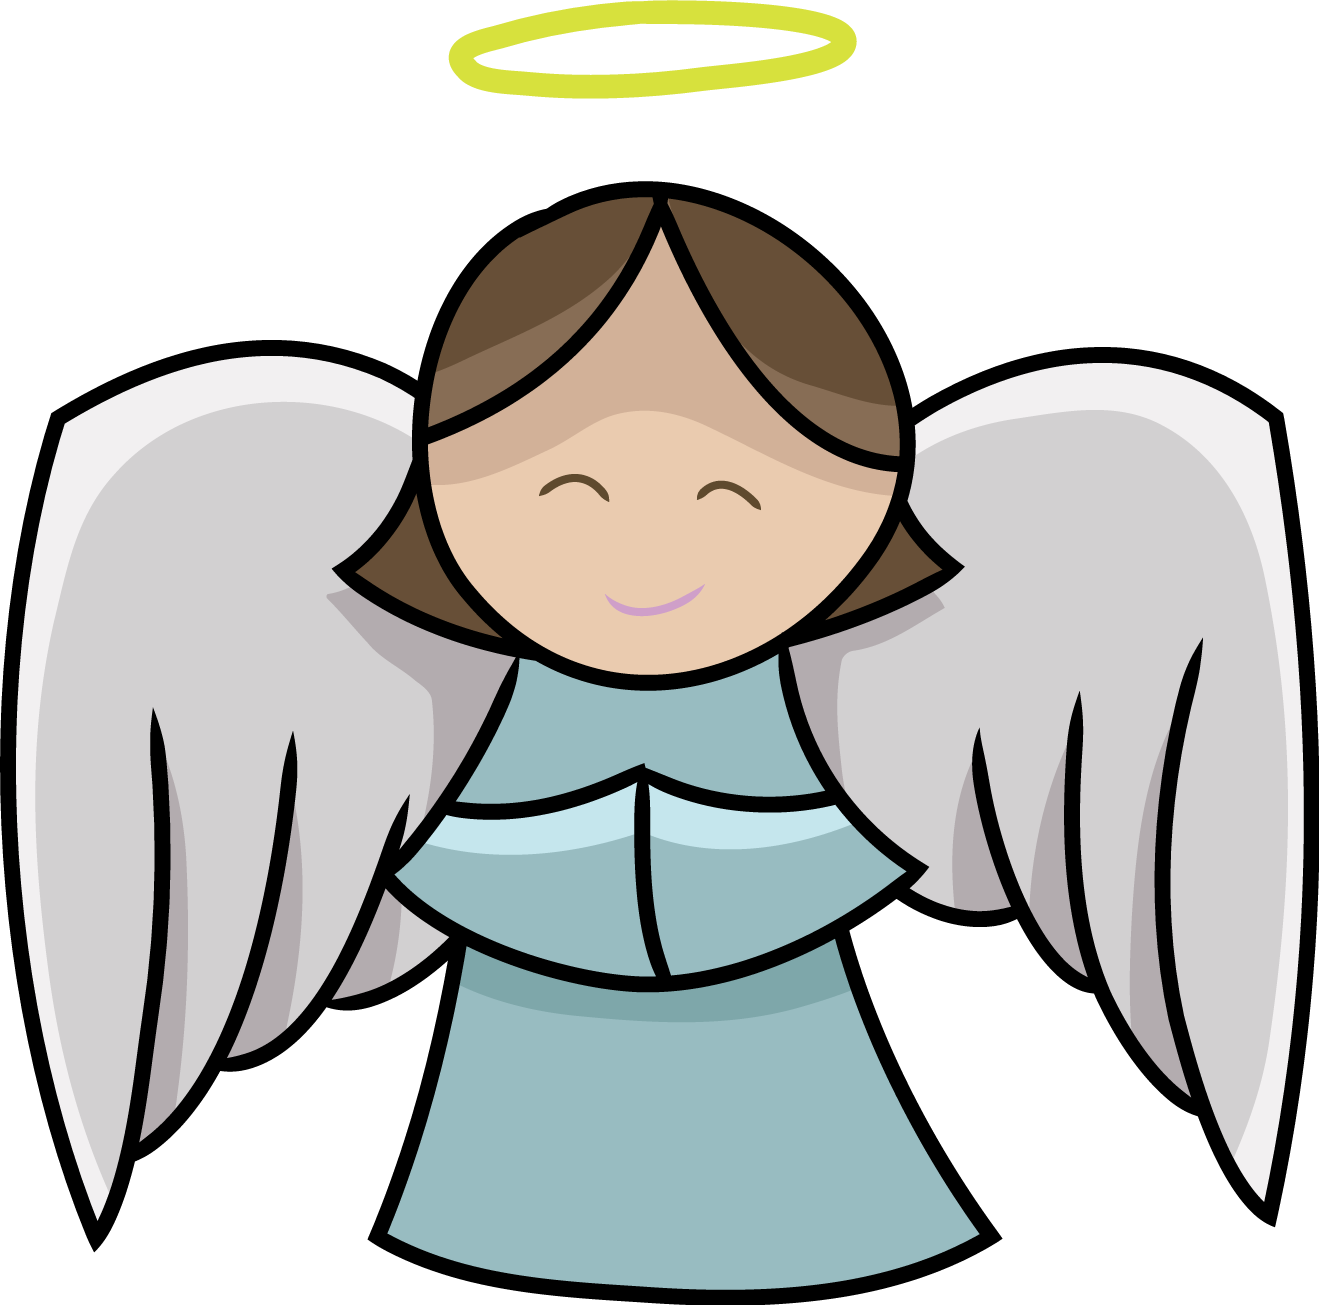 cartoon angel clipart - photo #25